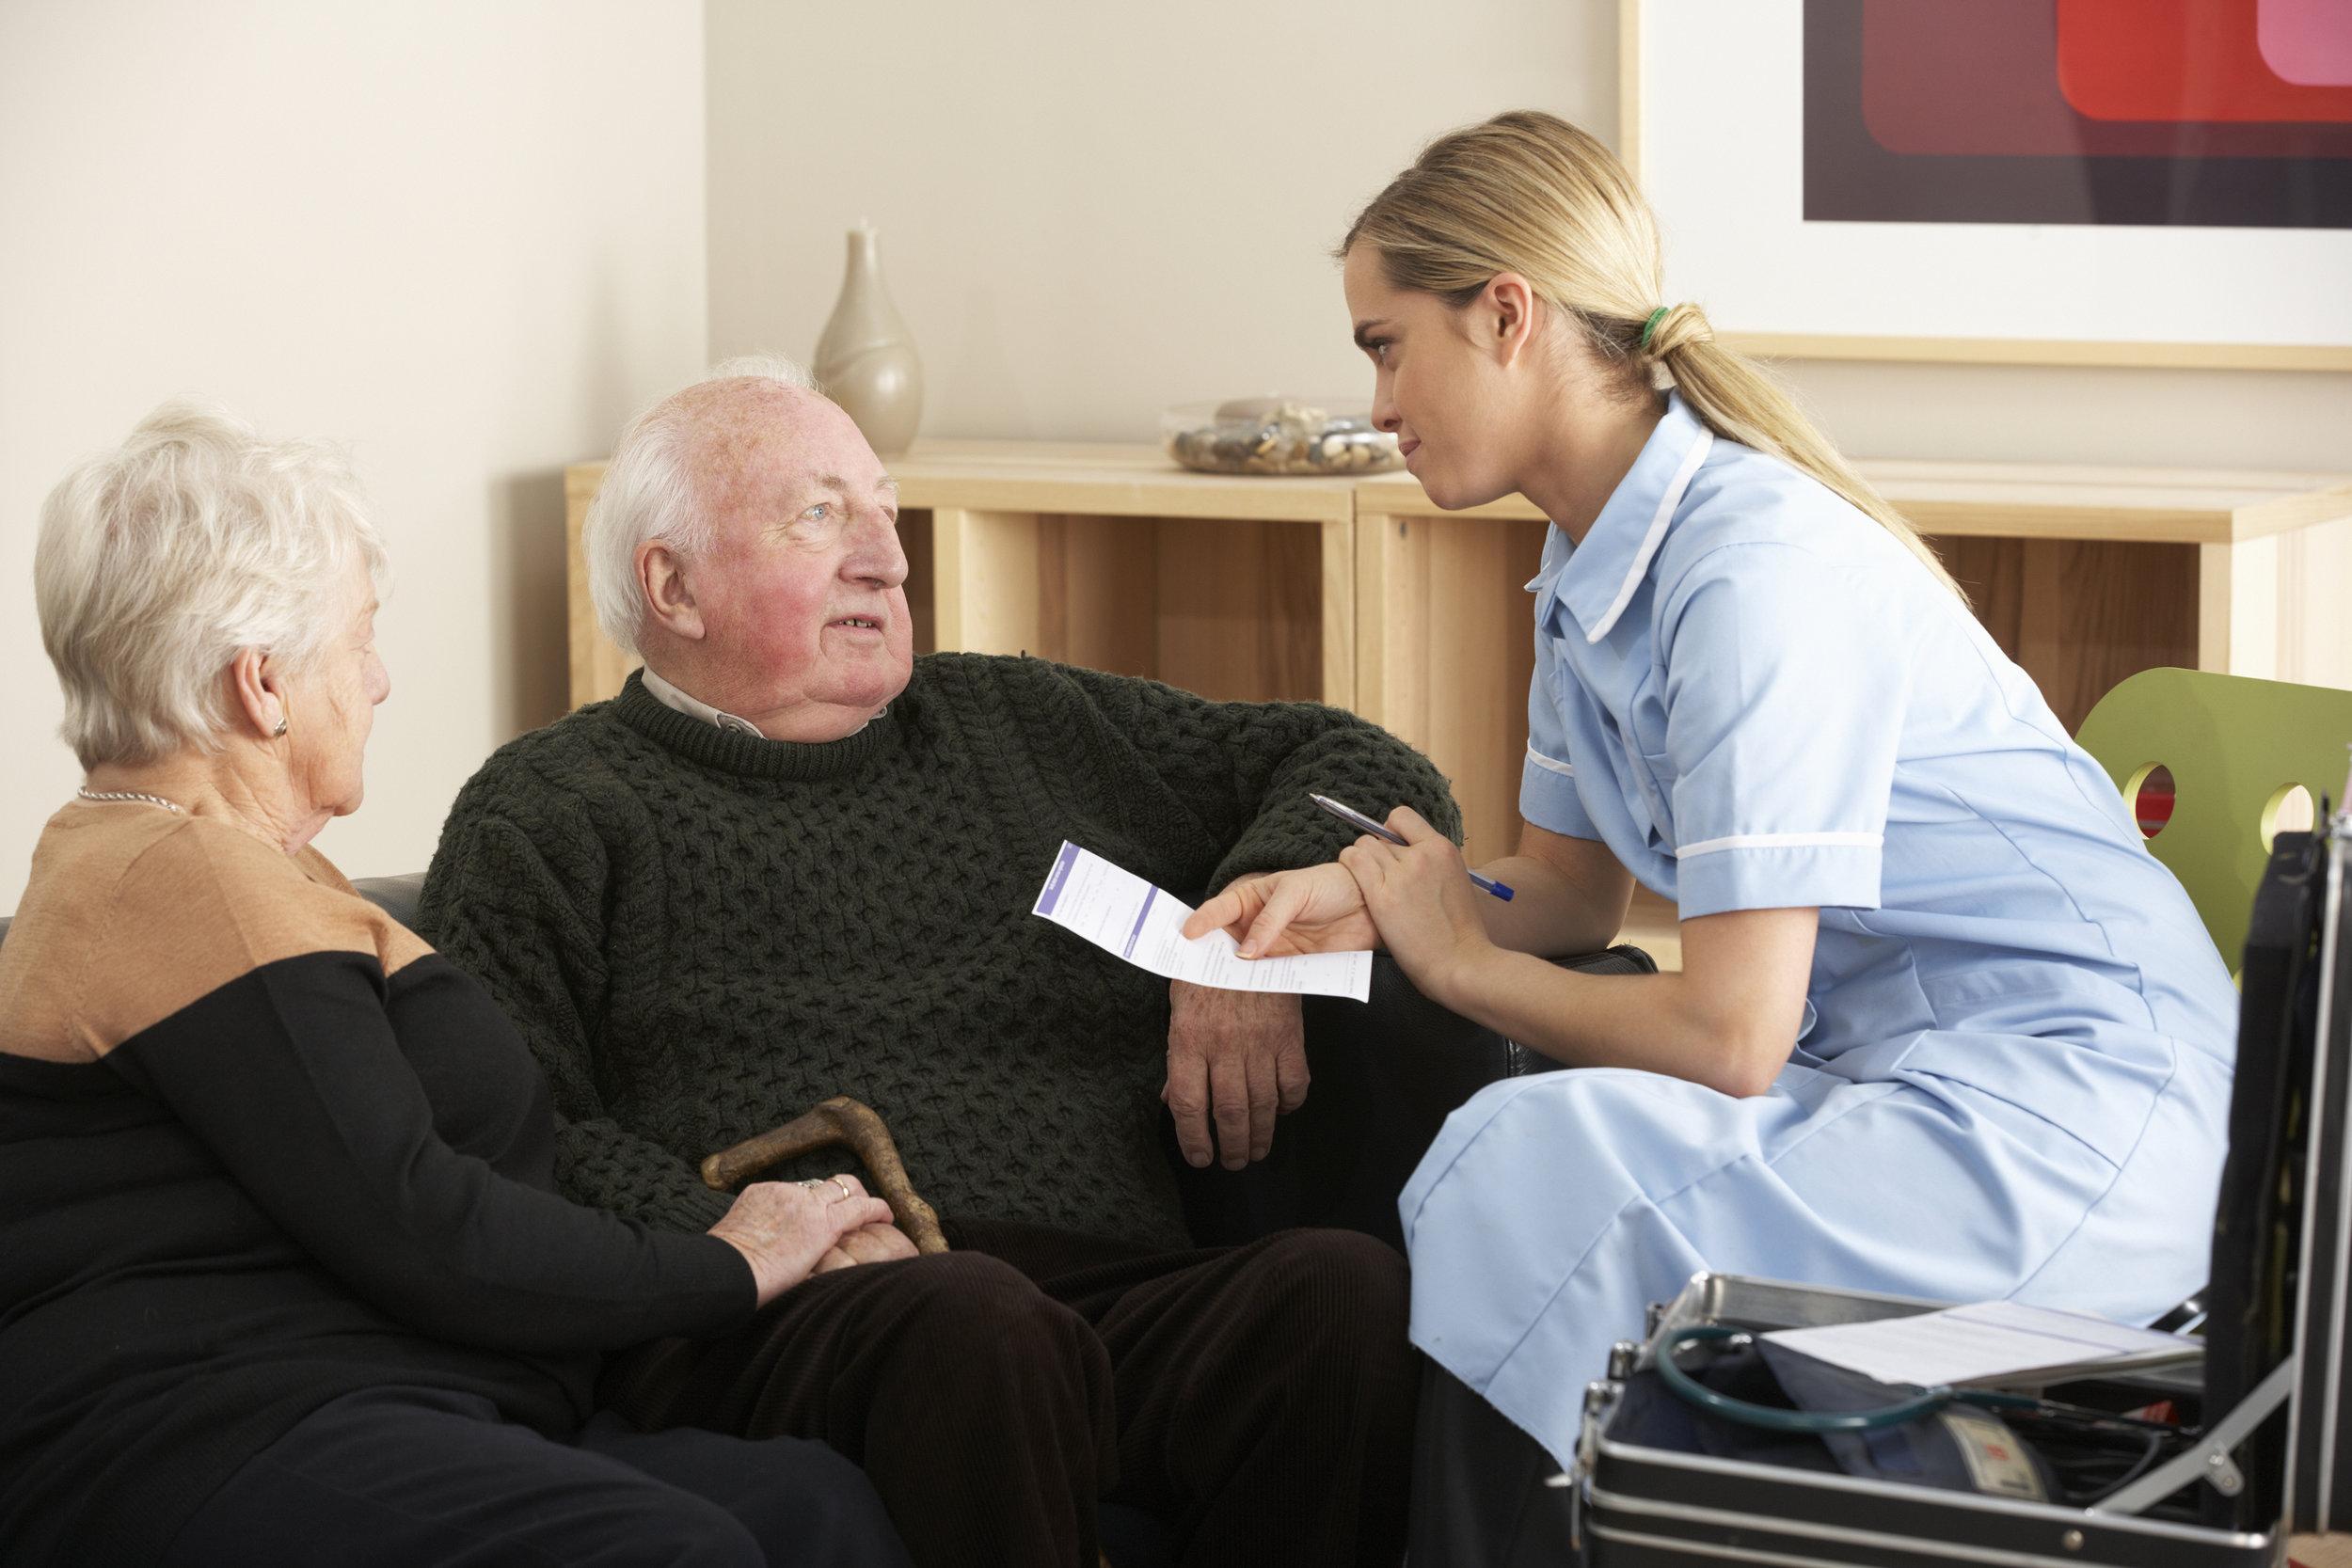 bigstock-Nurse-visiting-senior-couple-a-91345691 (1).jpg